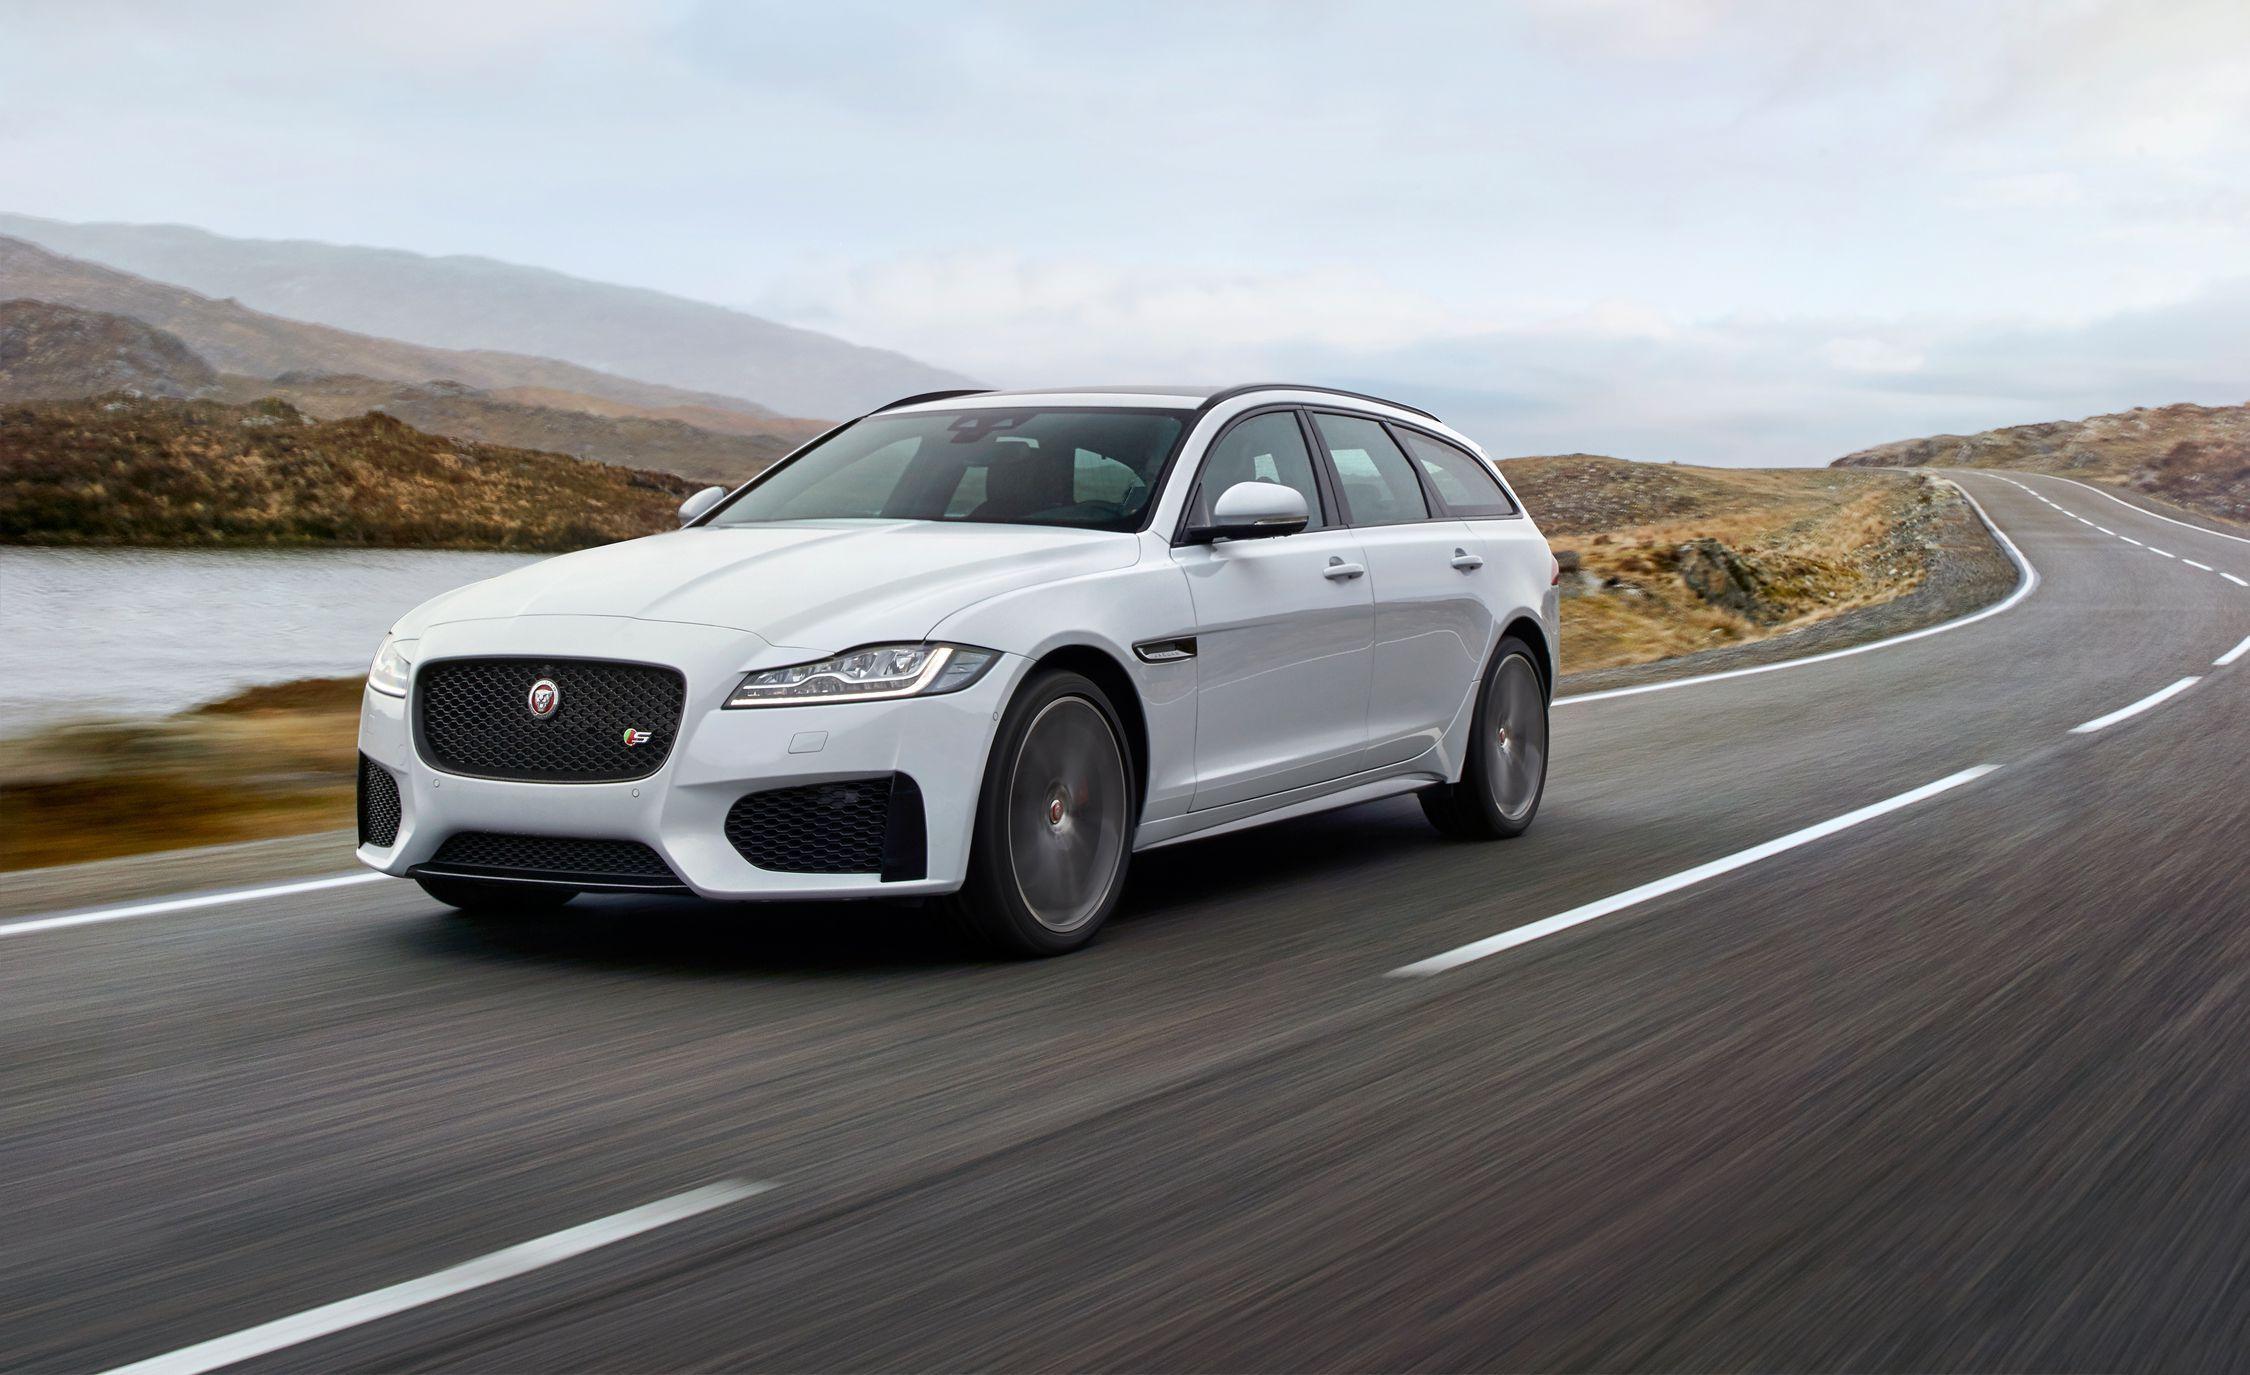 New G Wagon 2017 >> 2018 Jaguar XF Sportbrake Photos and Info| News | Car and Driver